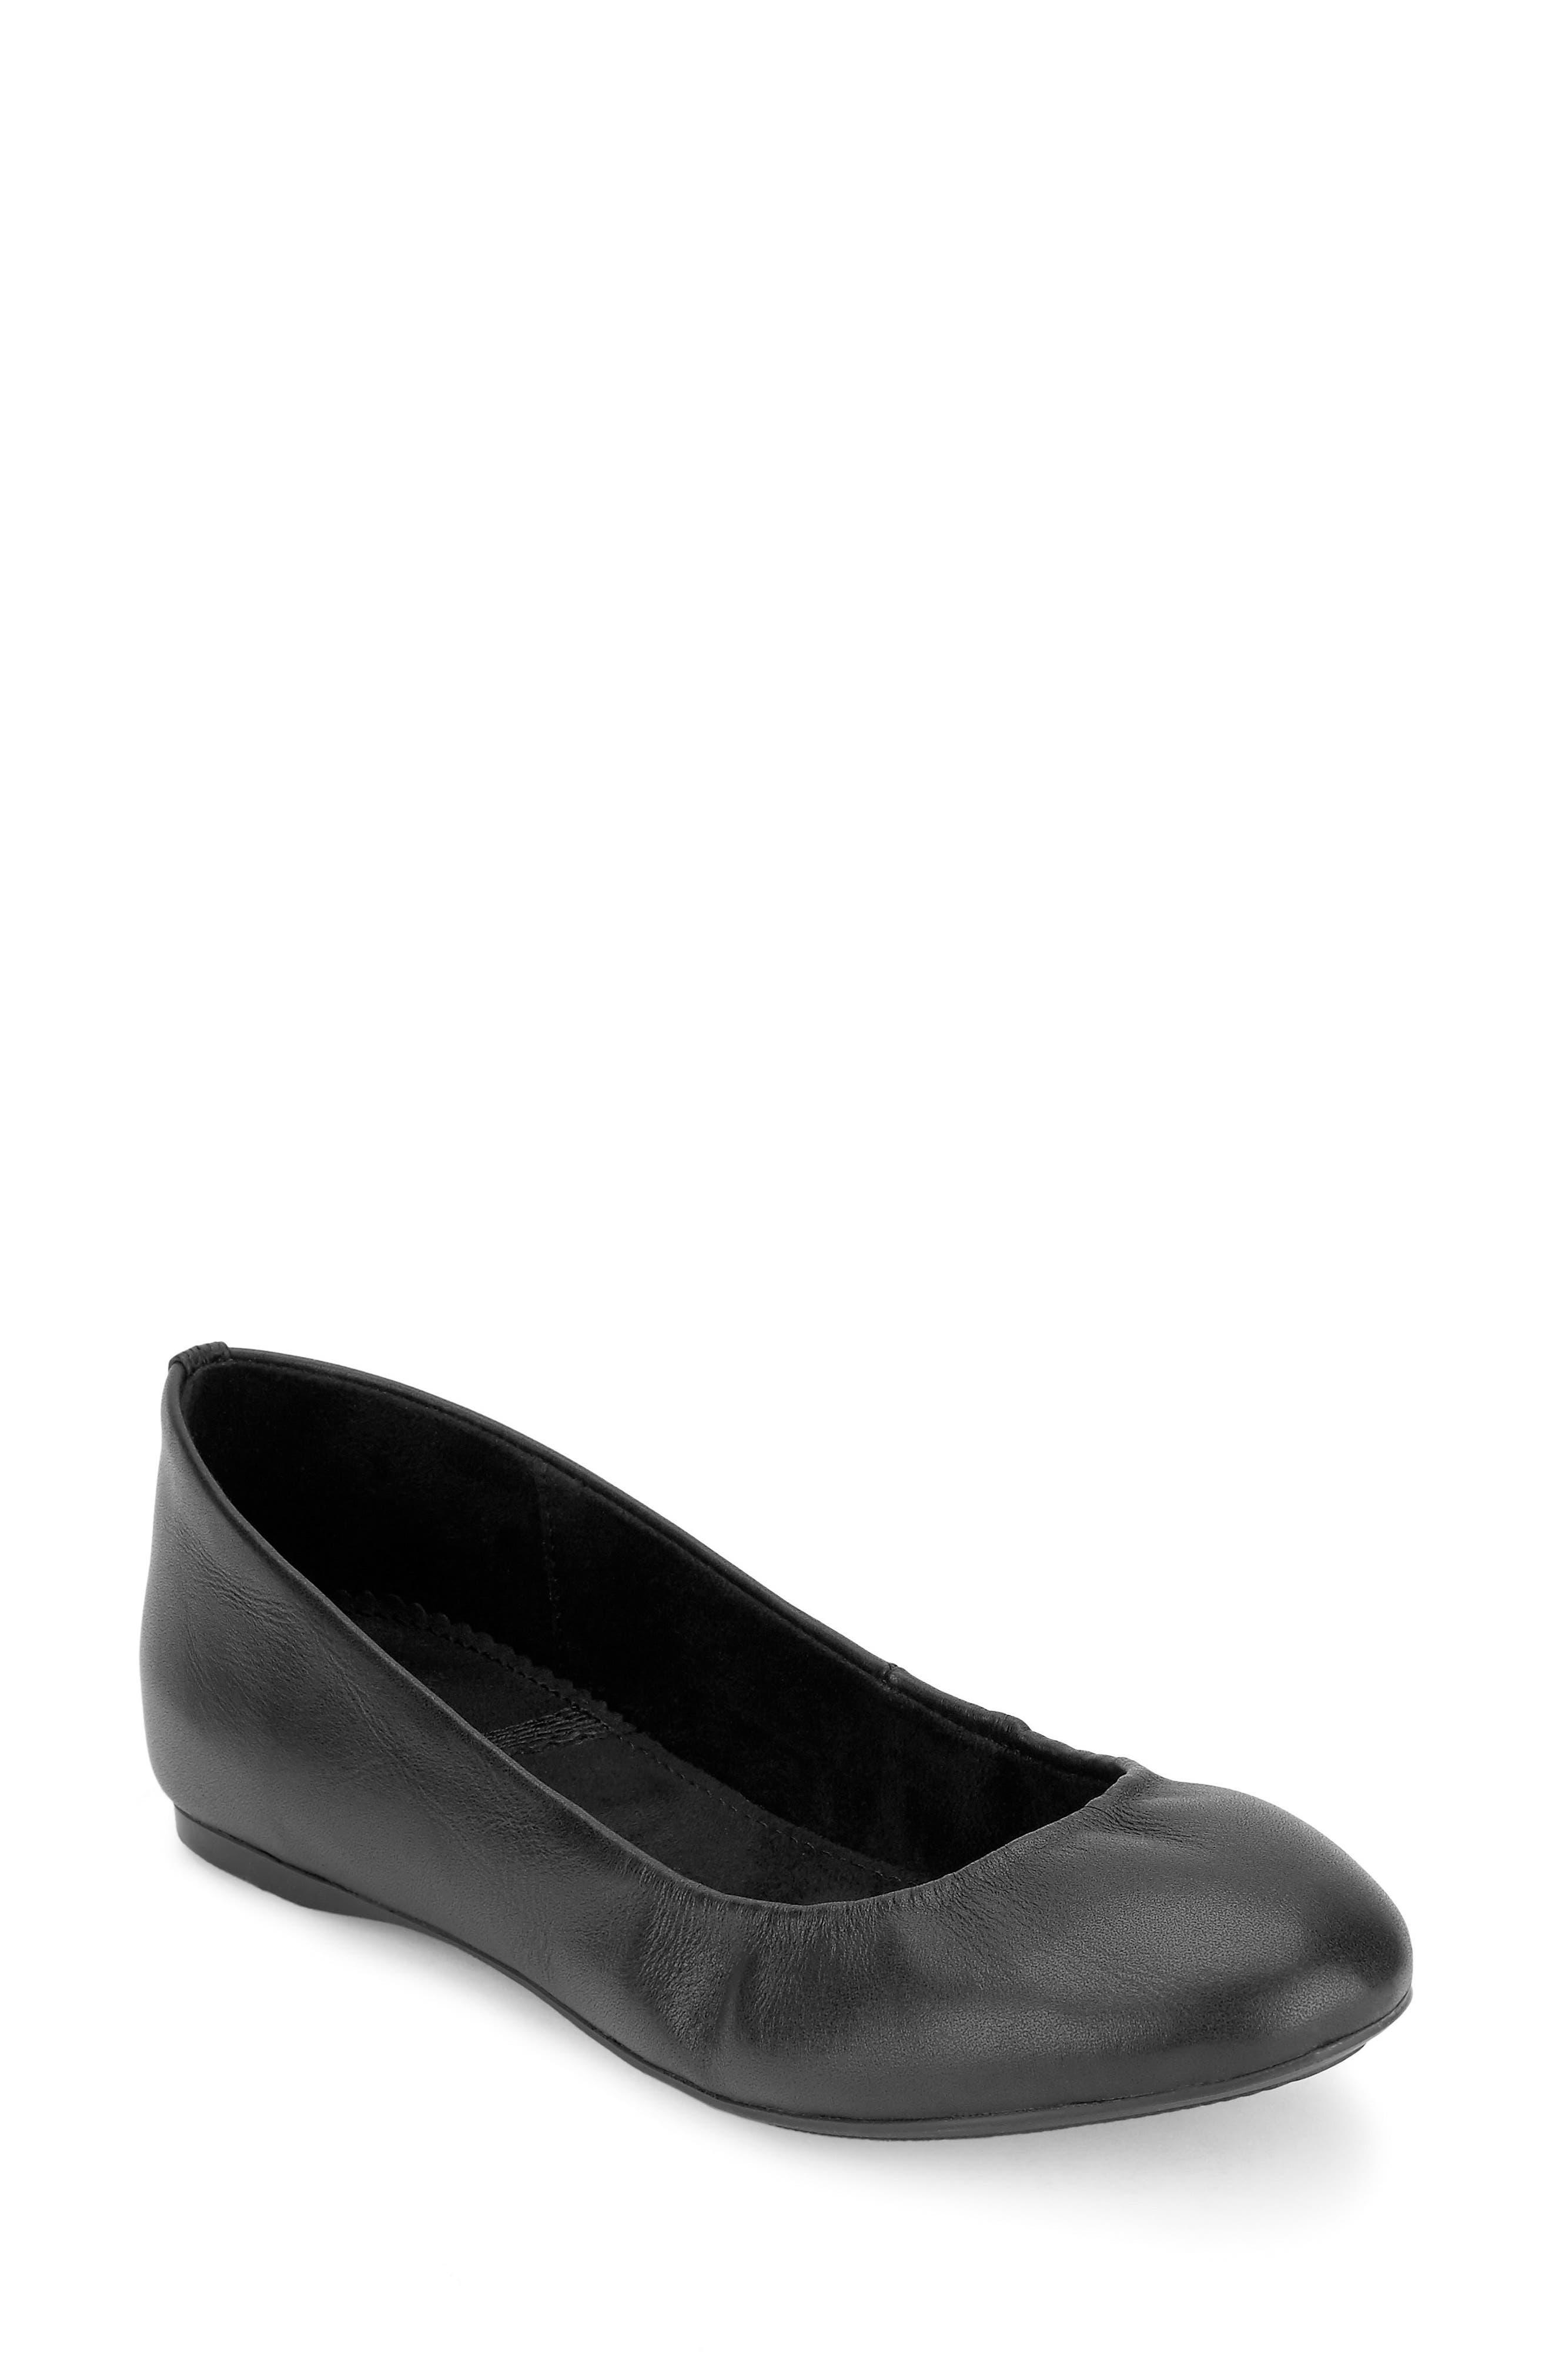 Felicity Ballet Flat,                         Main,                         color,